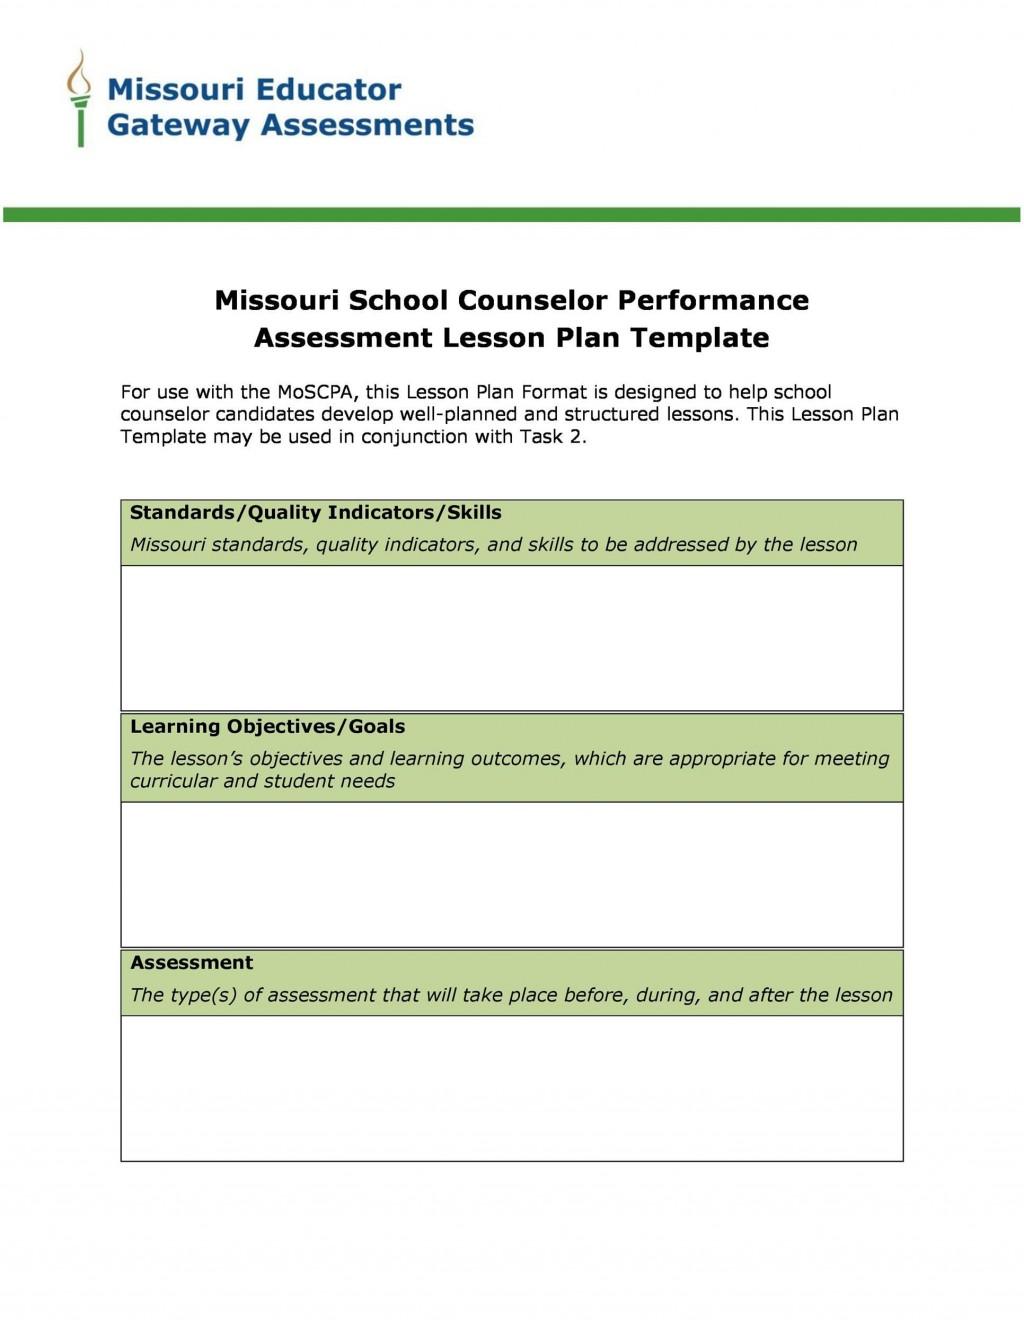 004 Astounding Weekly Lesson Plan Template Editable High Resolution  Google Doc Preschool Downloadable FreeLarge